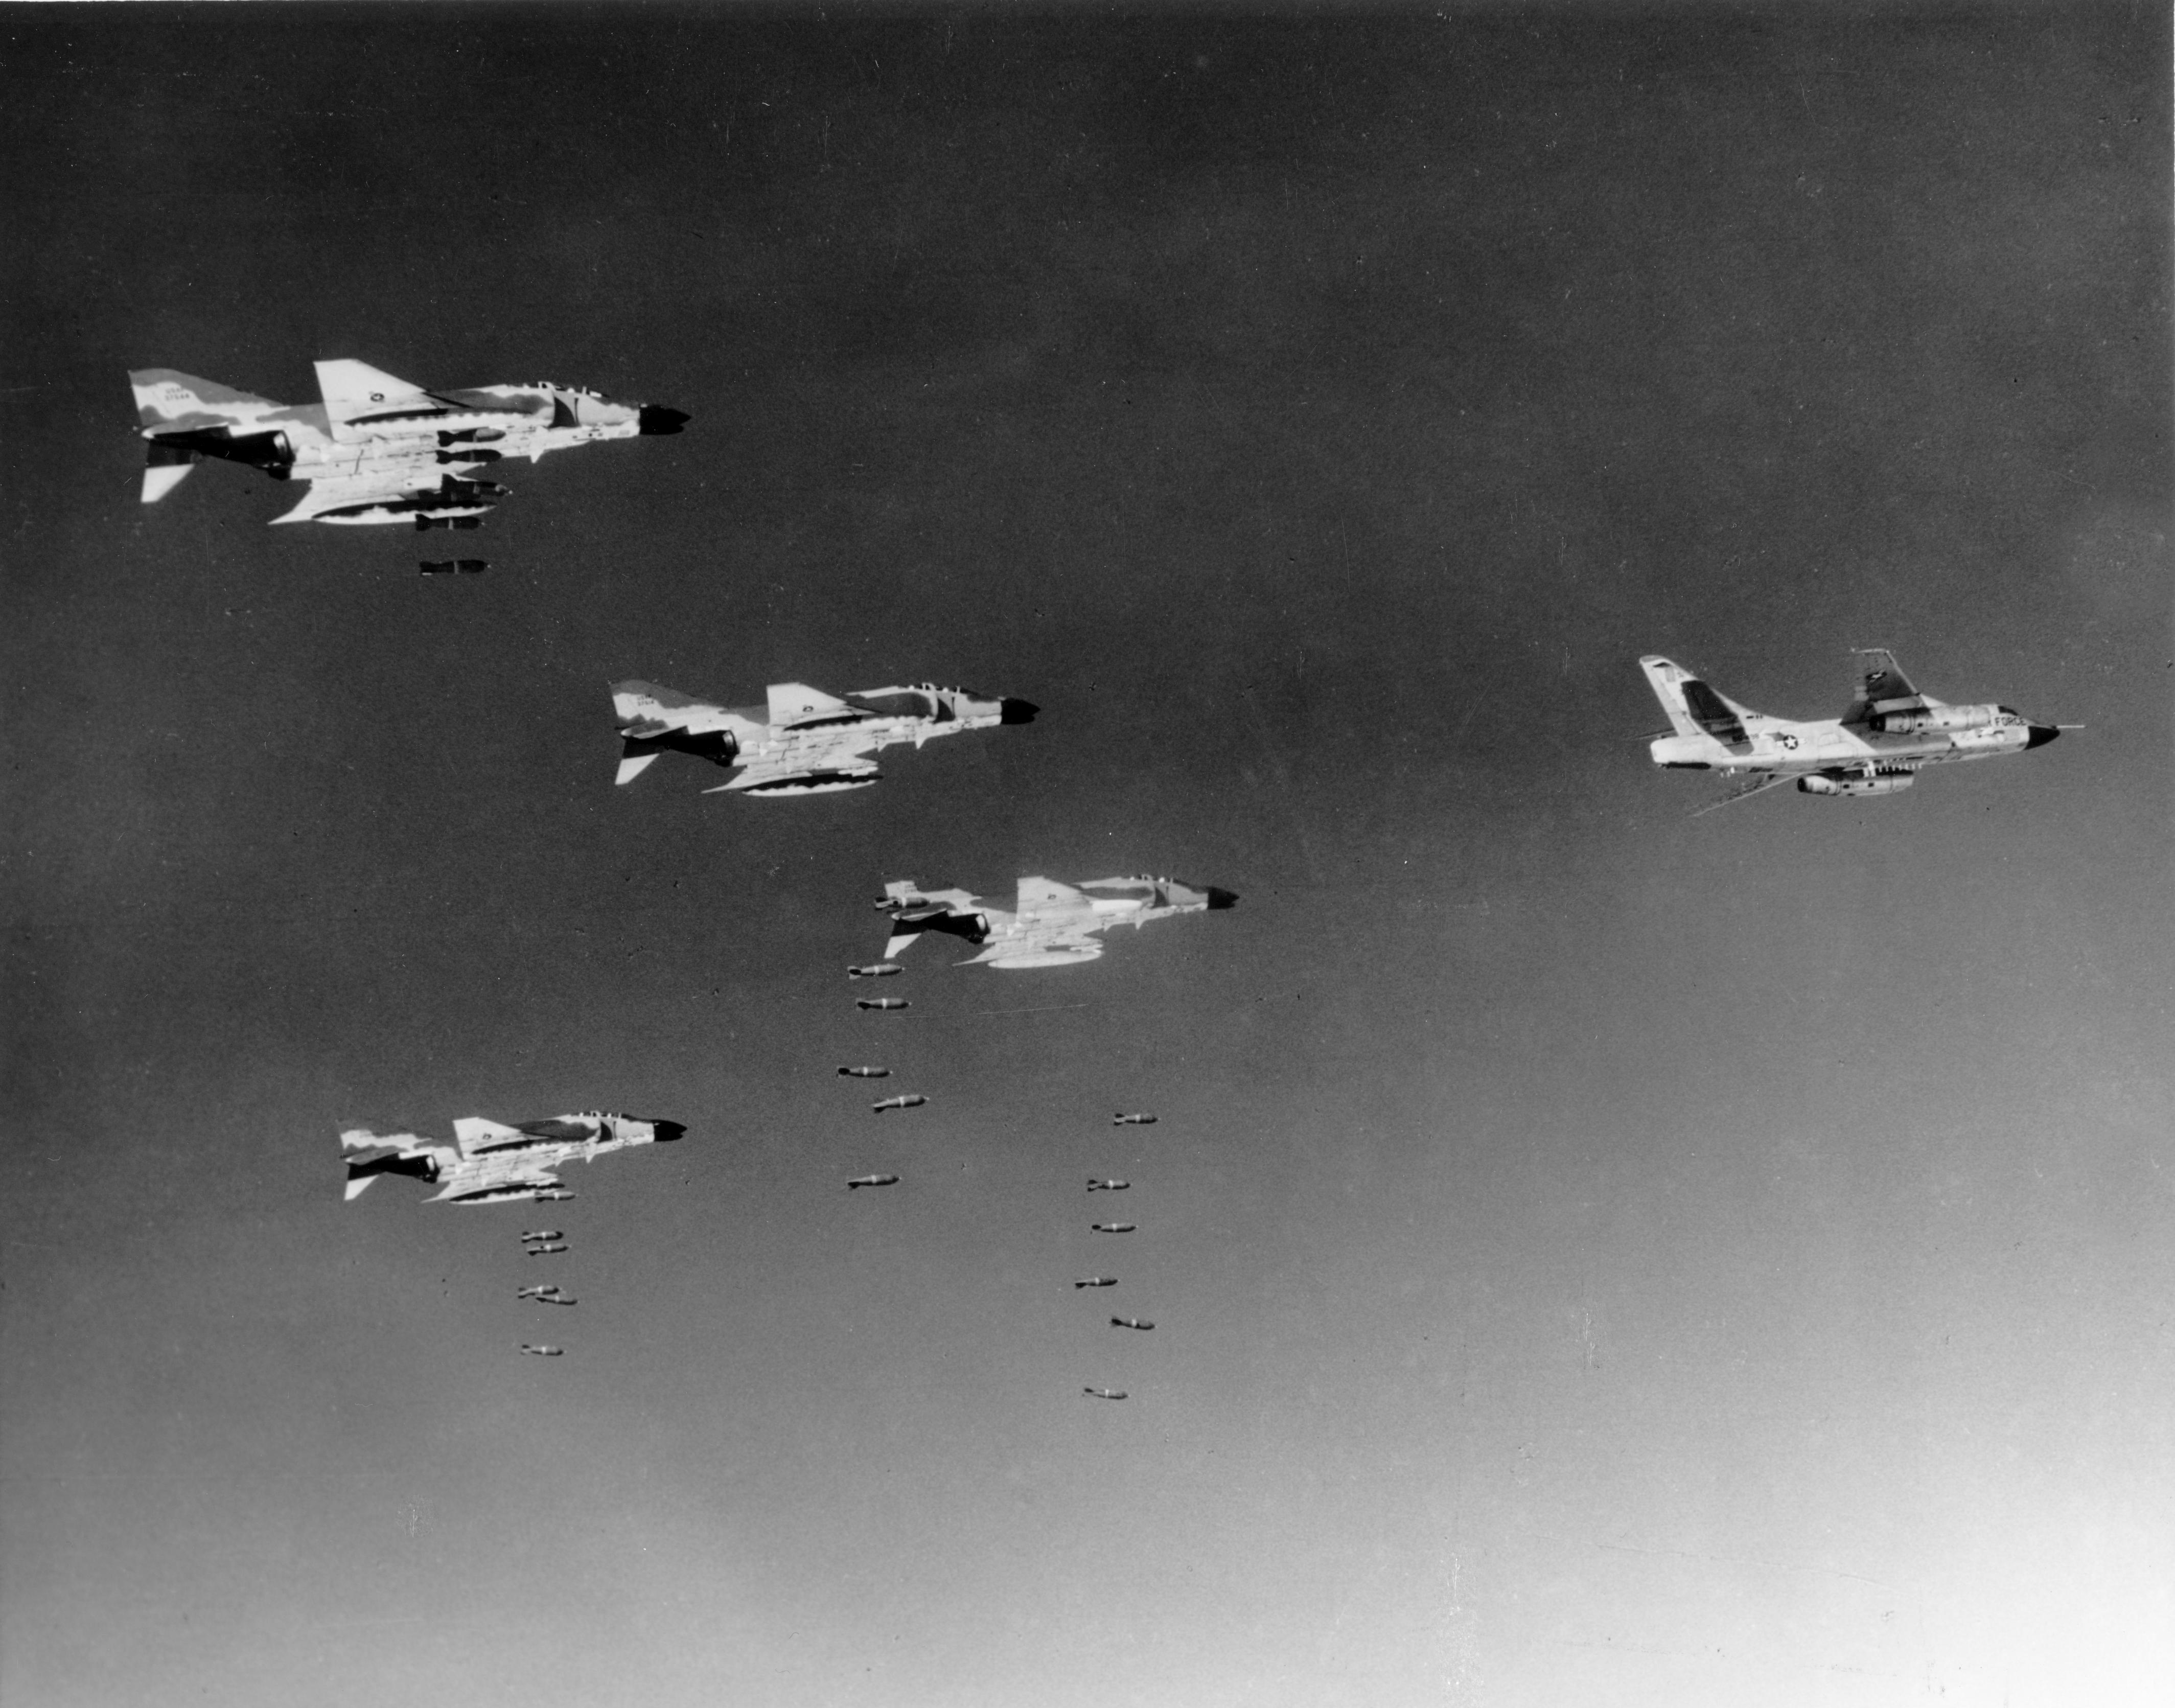 guerre du vietnam - Page 2 F-4Cs_RB-66C_bombing_Vietnam_1966